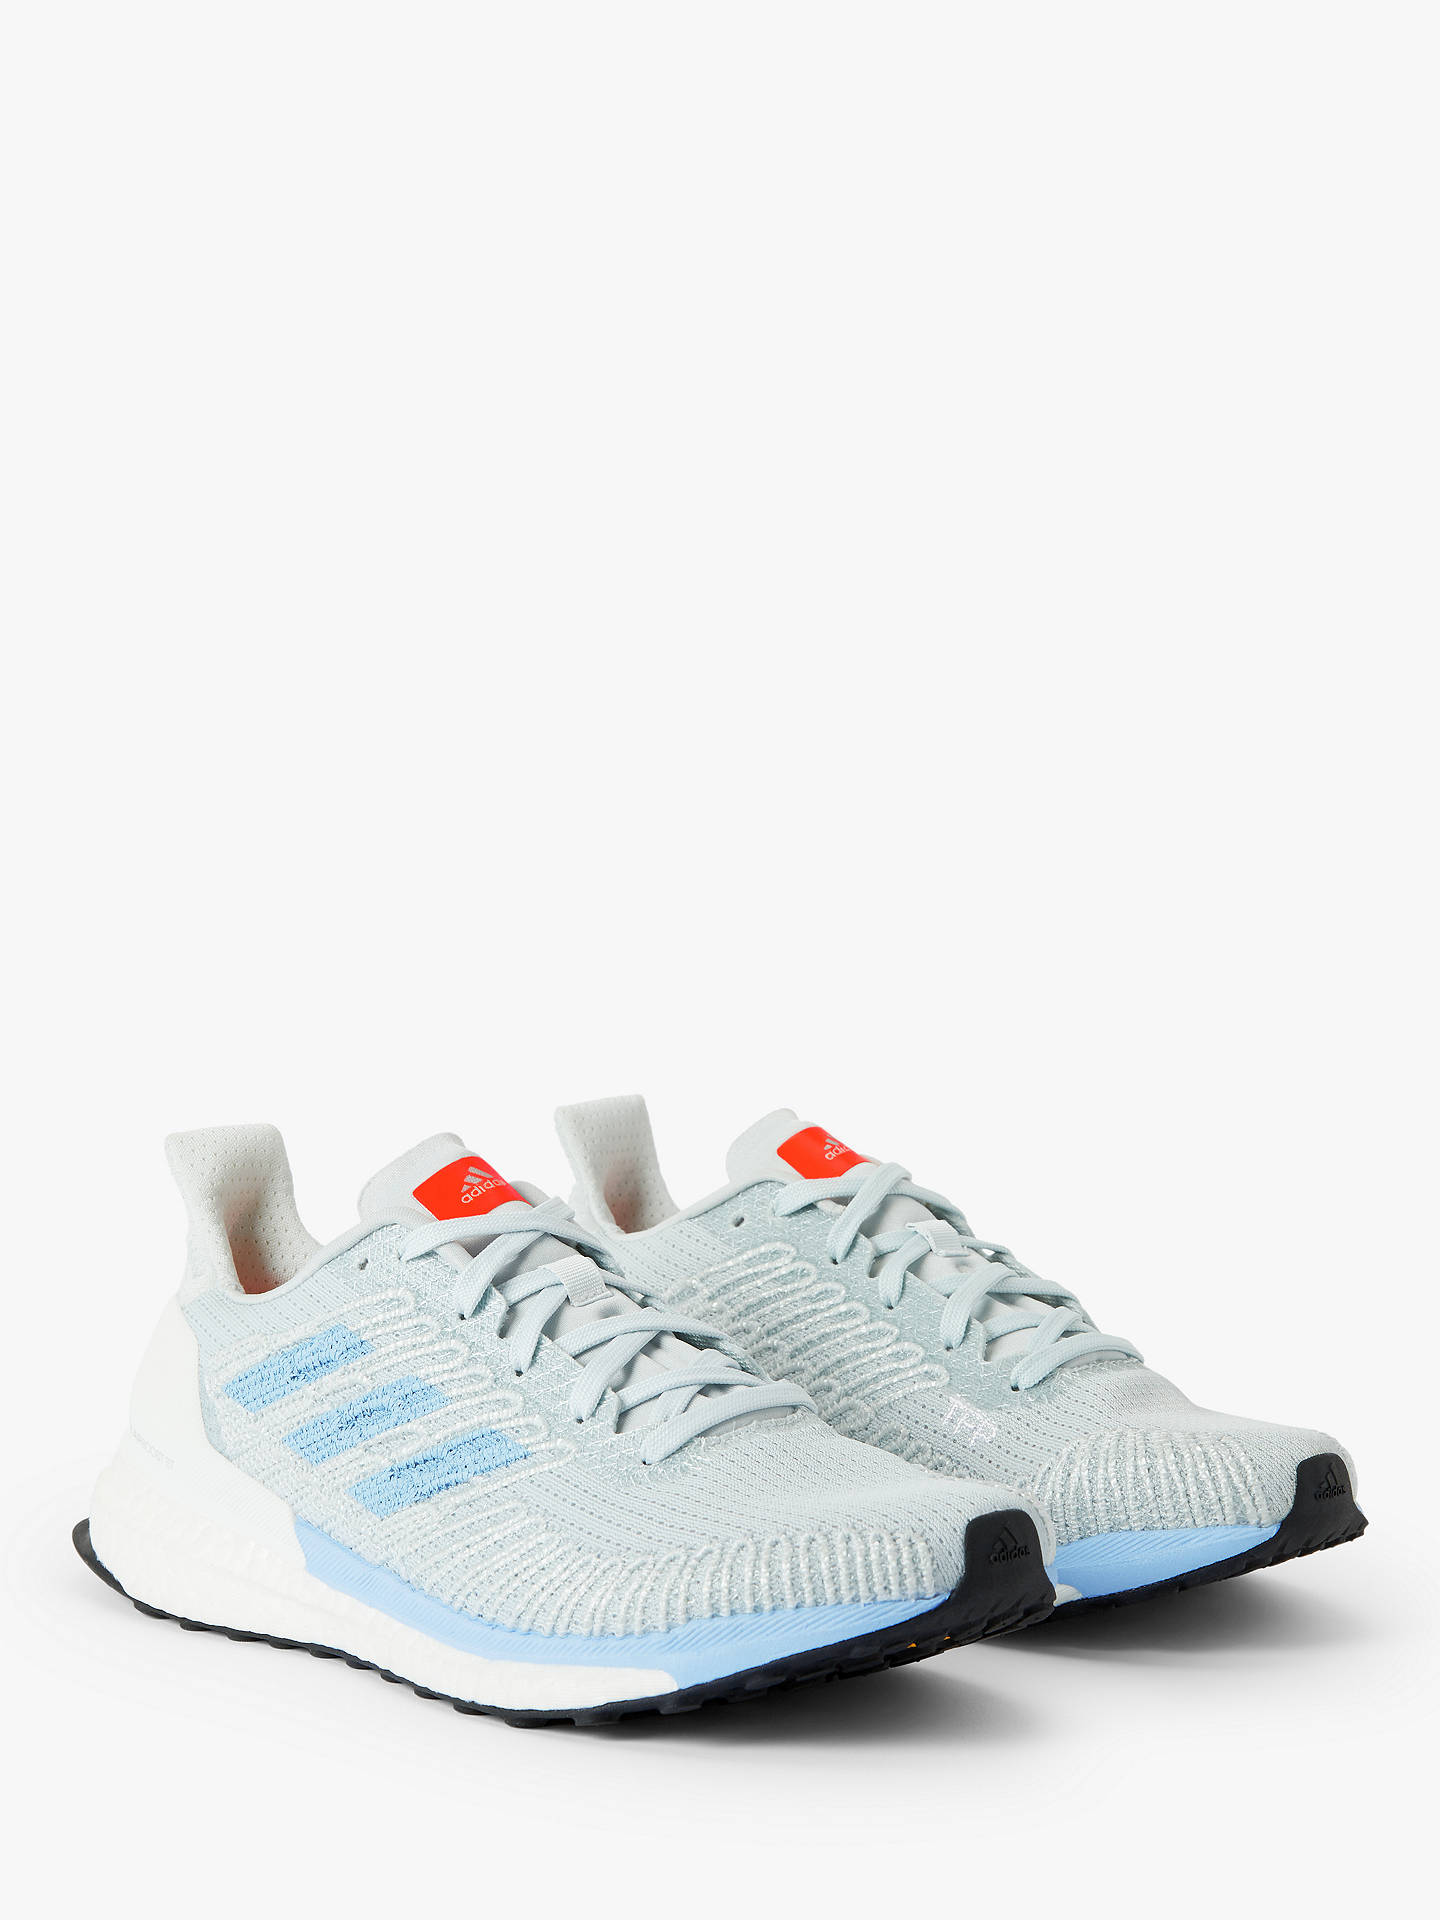 filósofo Impotencia Un fiel  adidas Solar Boost 19 ST Women's Running Shoes, Blue Tint/Glow Blue/Solar  Orange at John Lewis & Partners